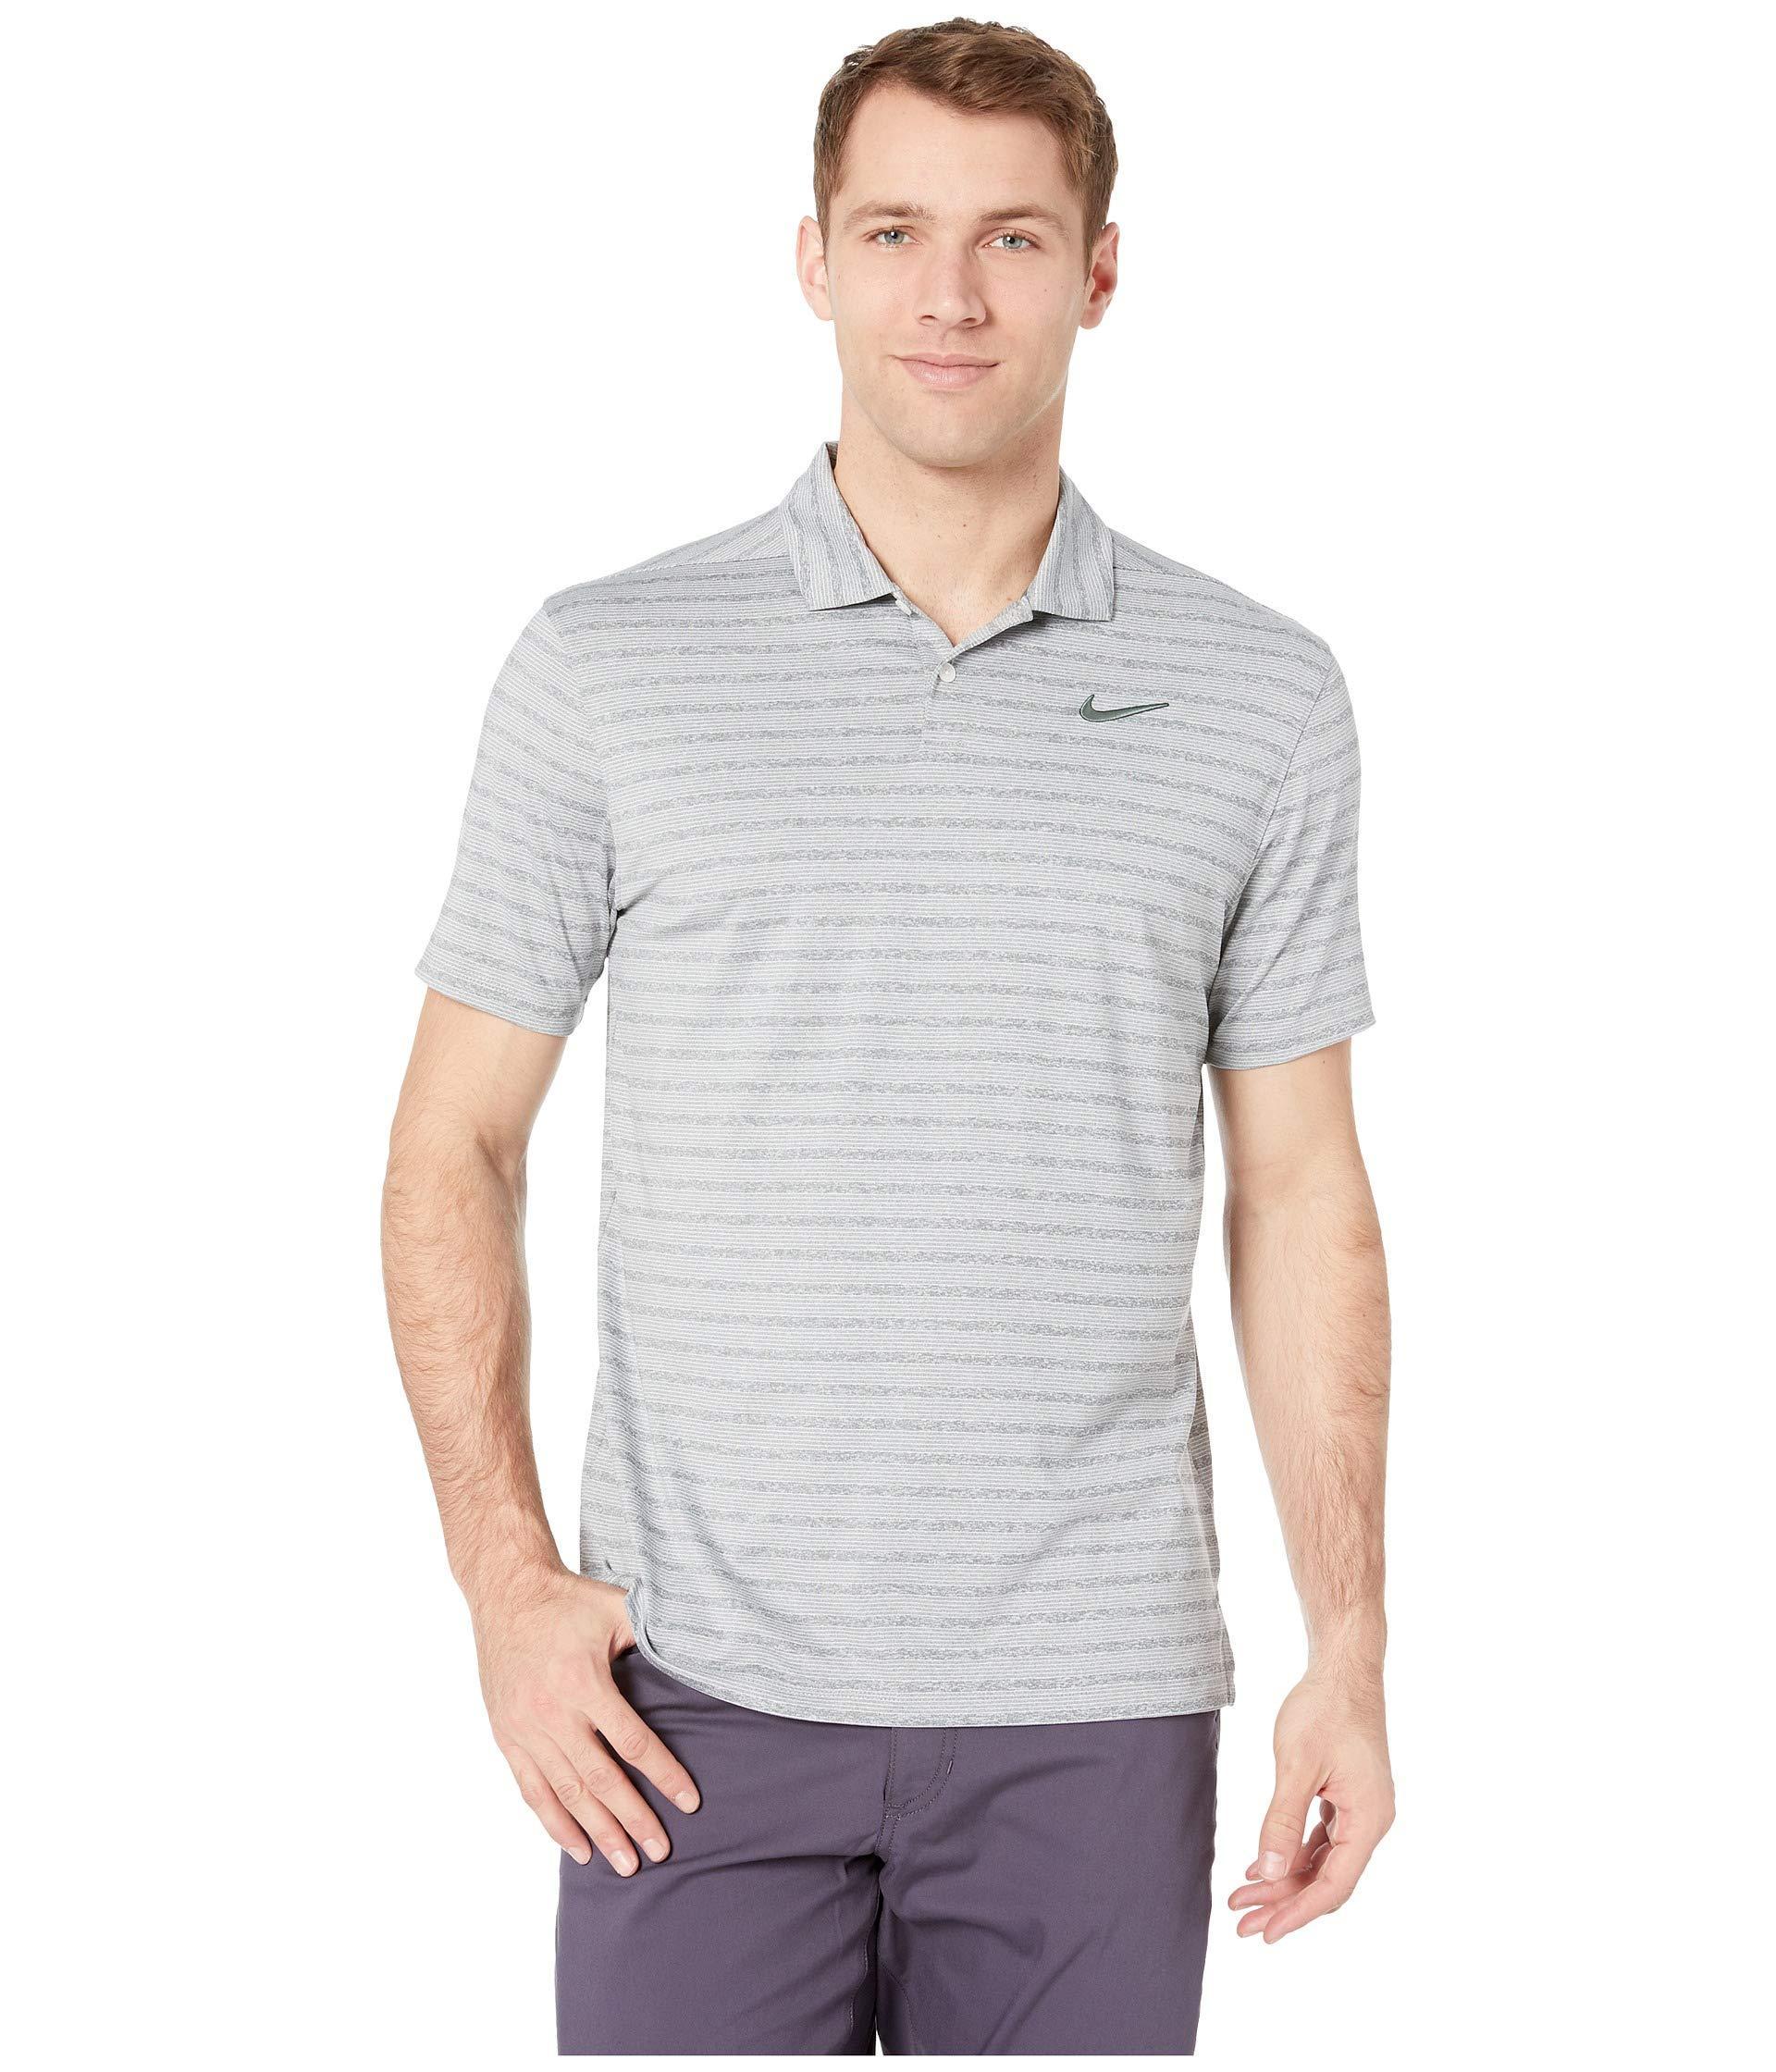 6d428890f Nike Dry Vapor Stripe Polo (aviator Grey/aviator Grey) Men's ...